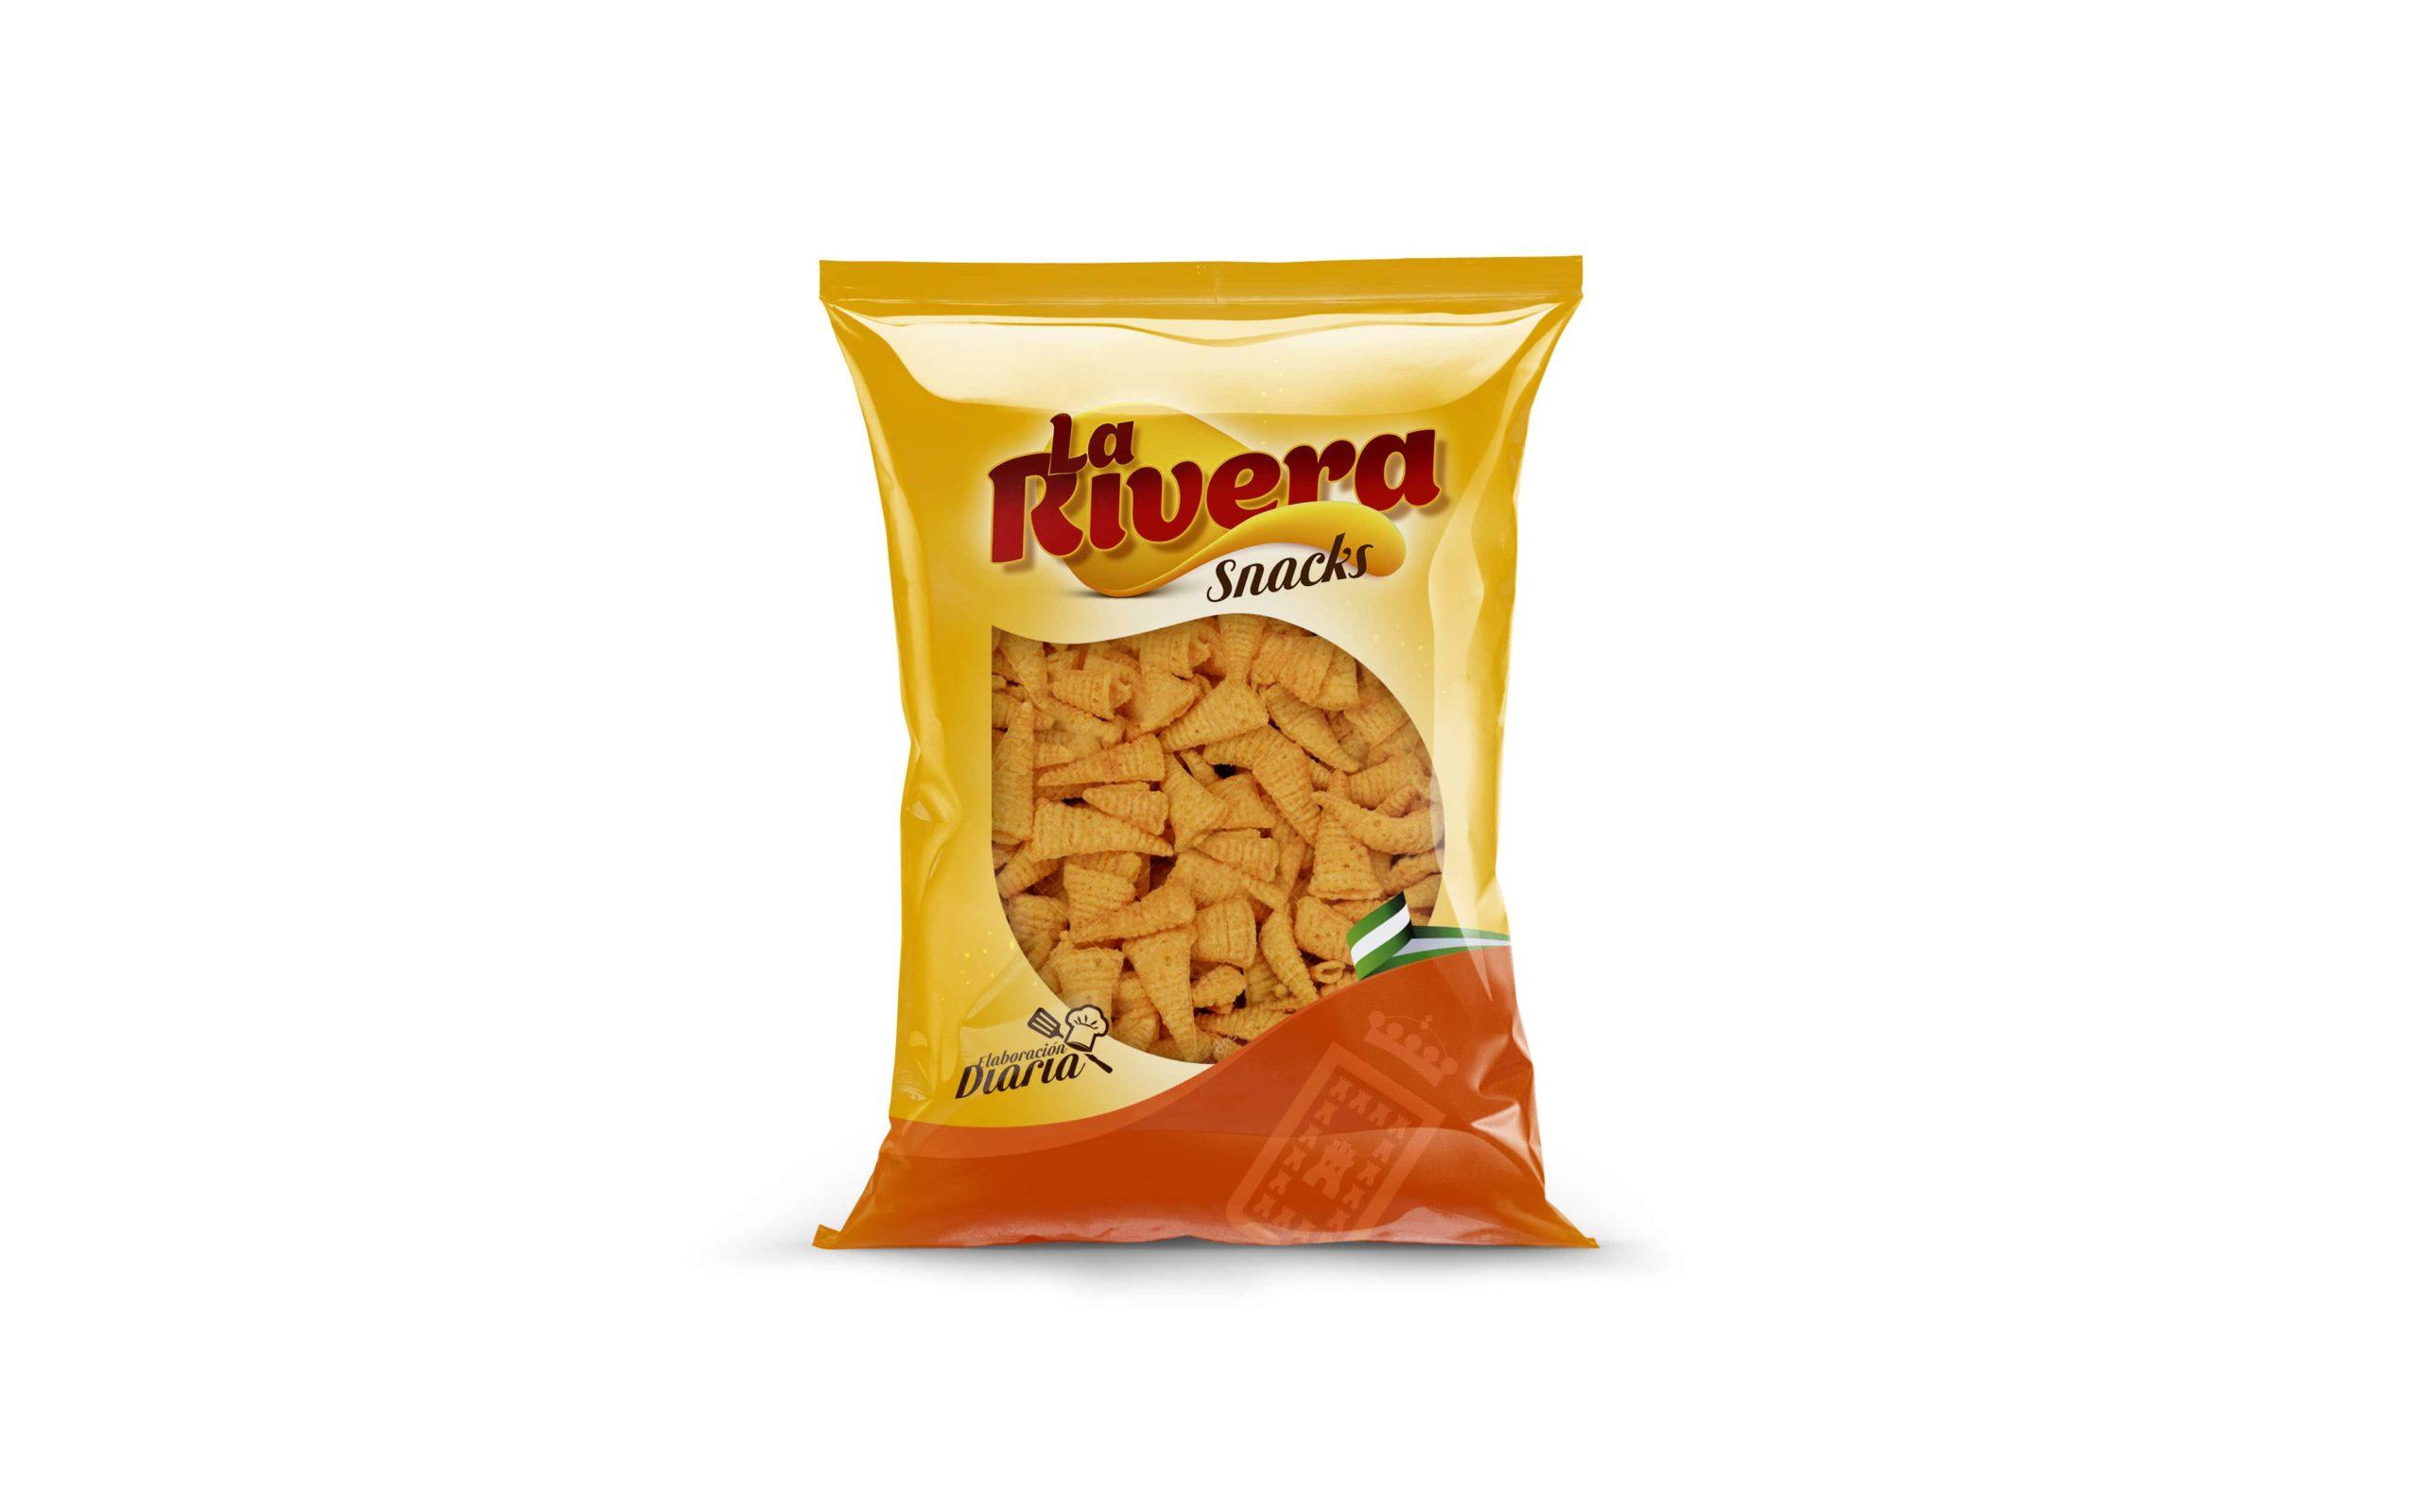 diseno-packaging-la-rivera-conos-min